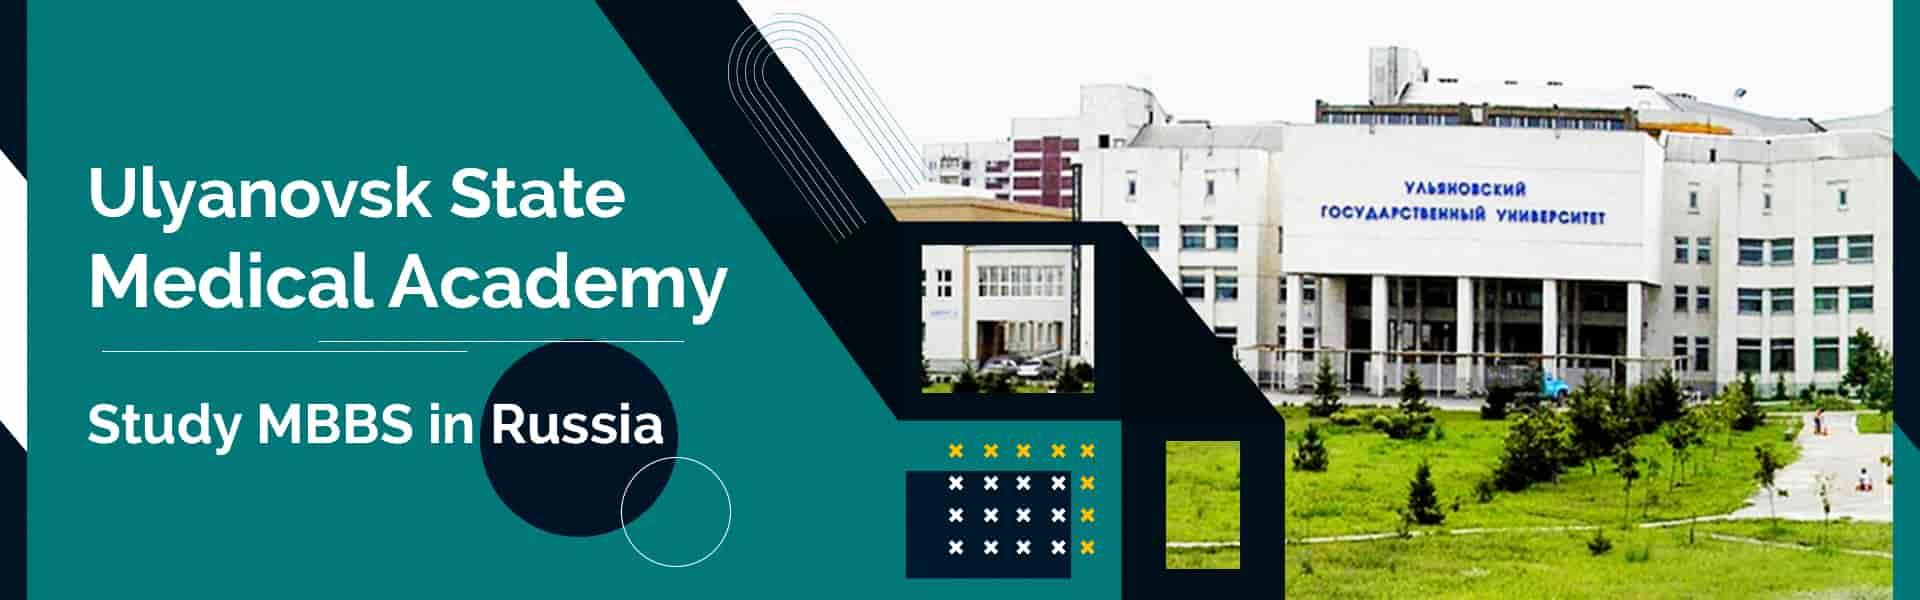 Ulyanovsk State Medical University